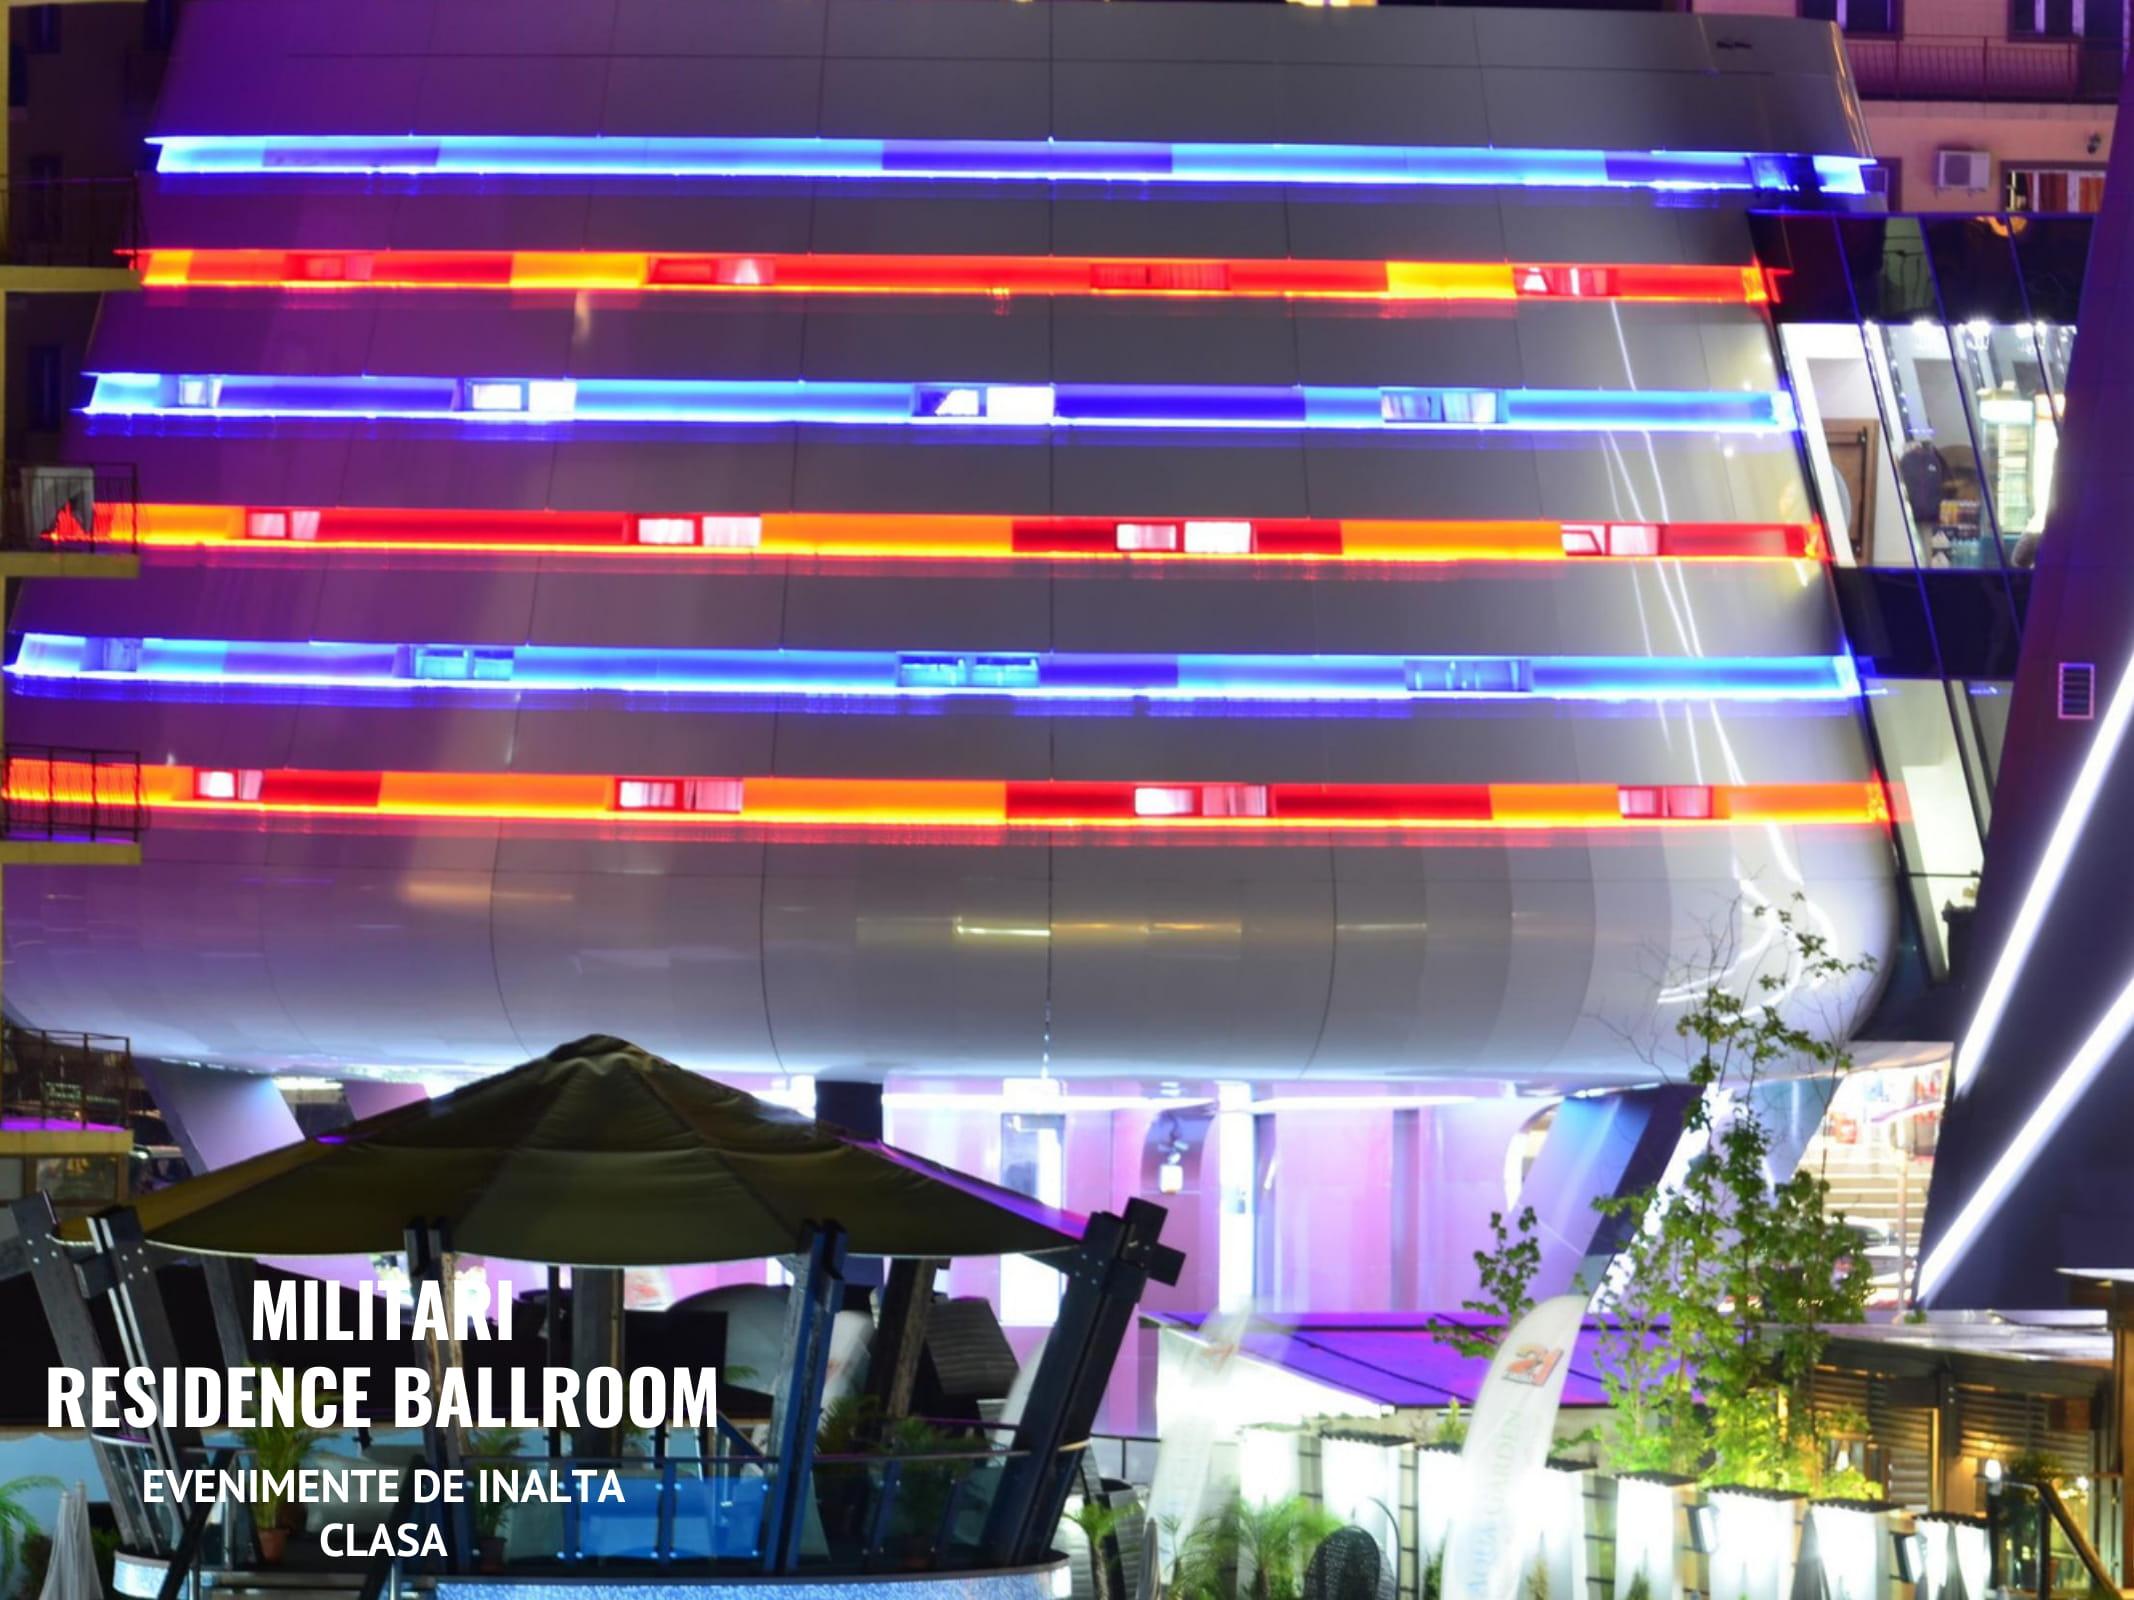 Militari Residence Ballroom Corporate-2